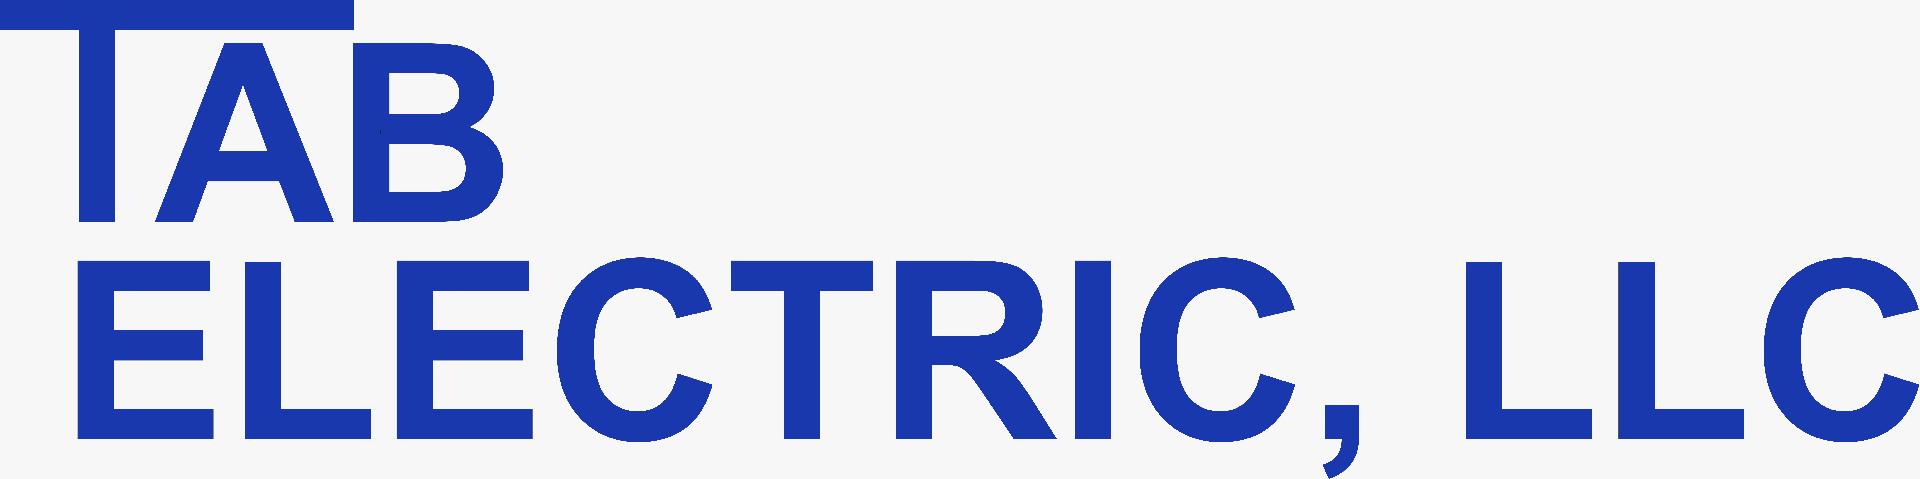 TAB Electric, LLC image 0